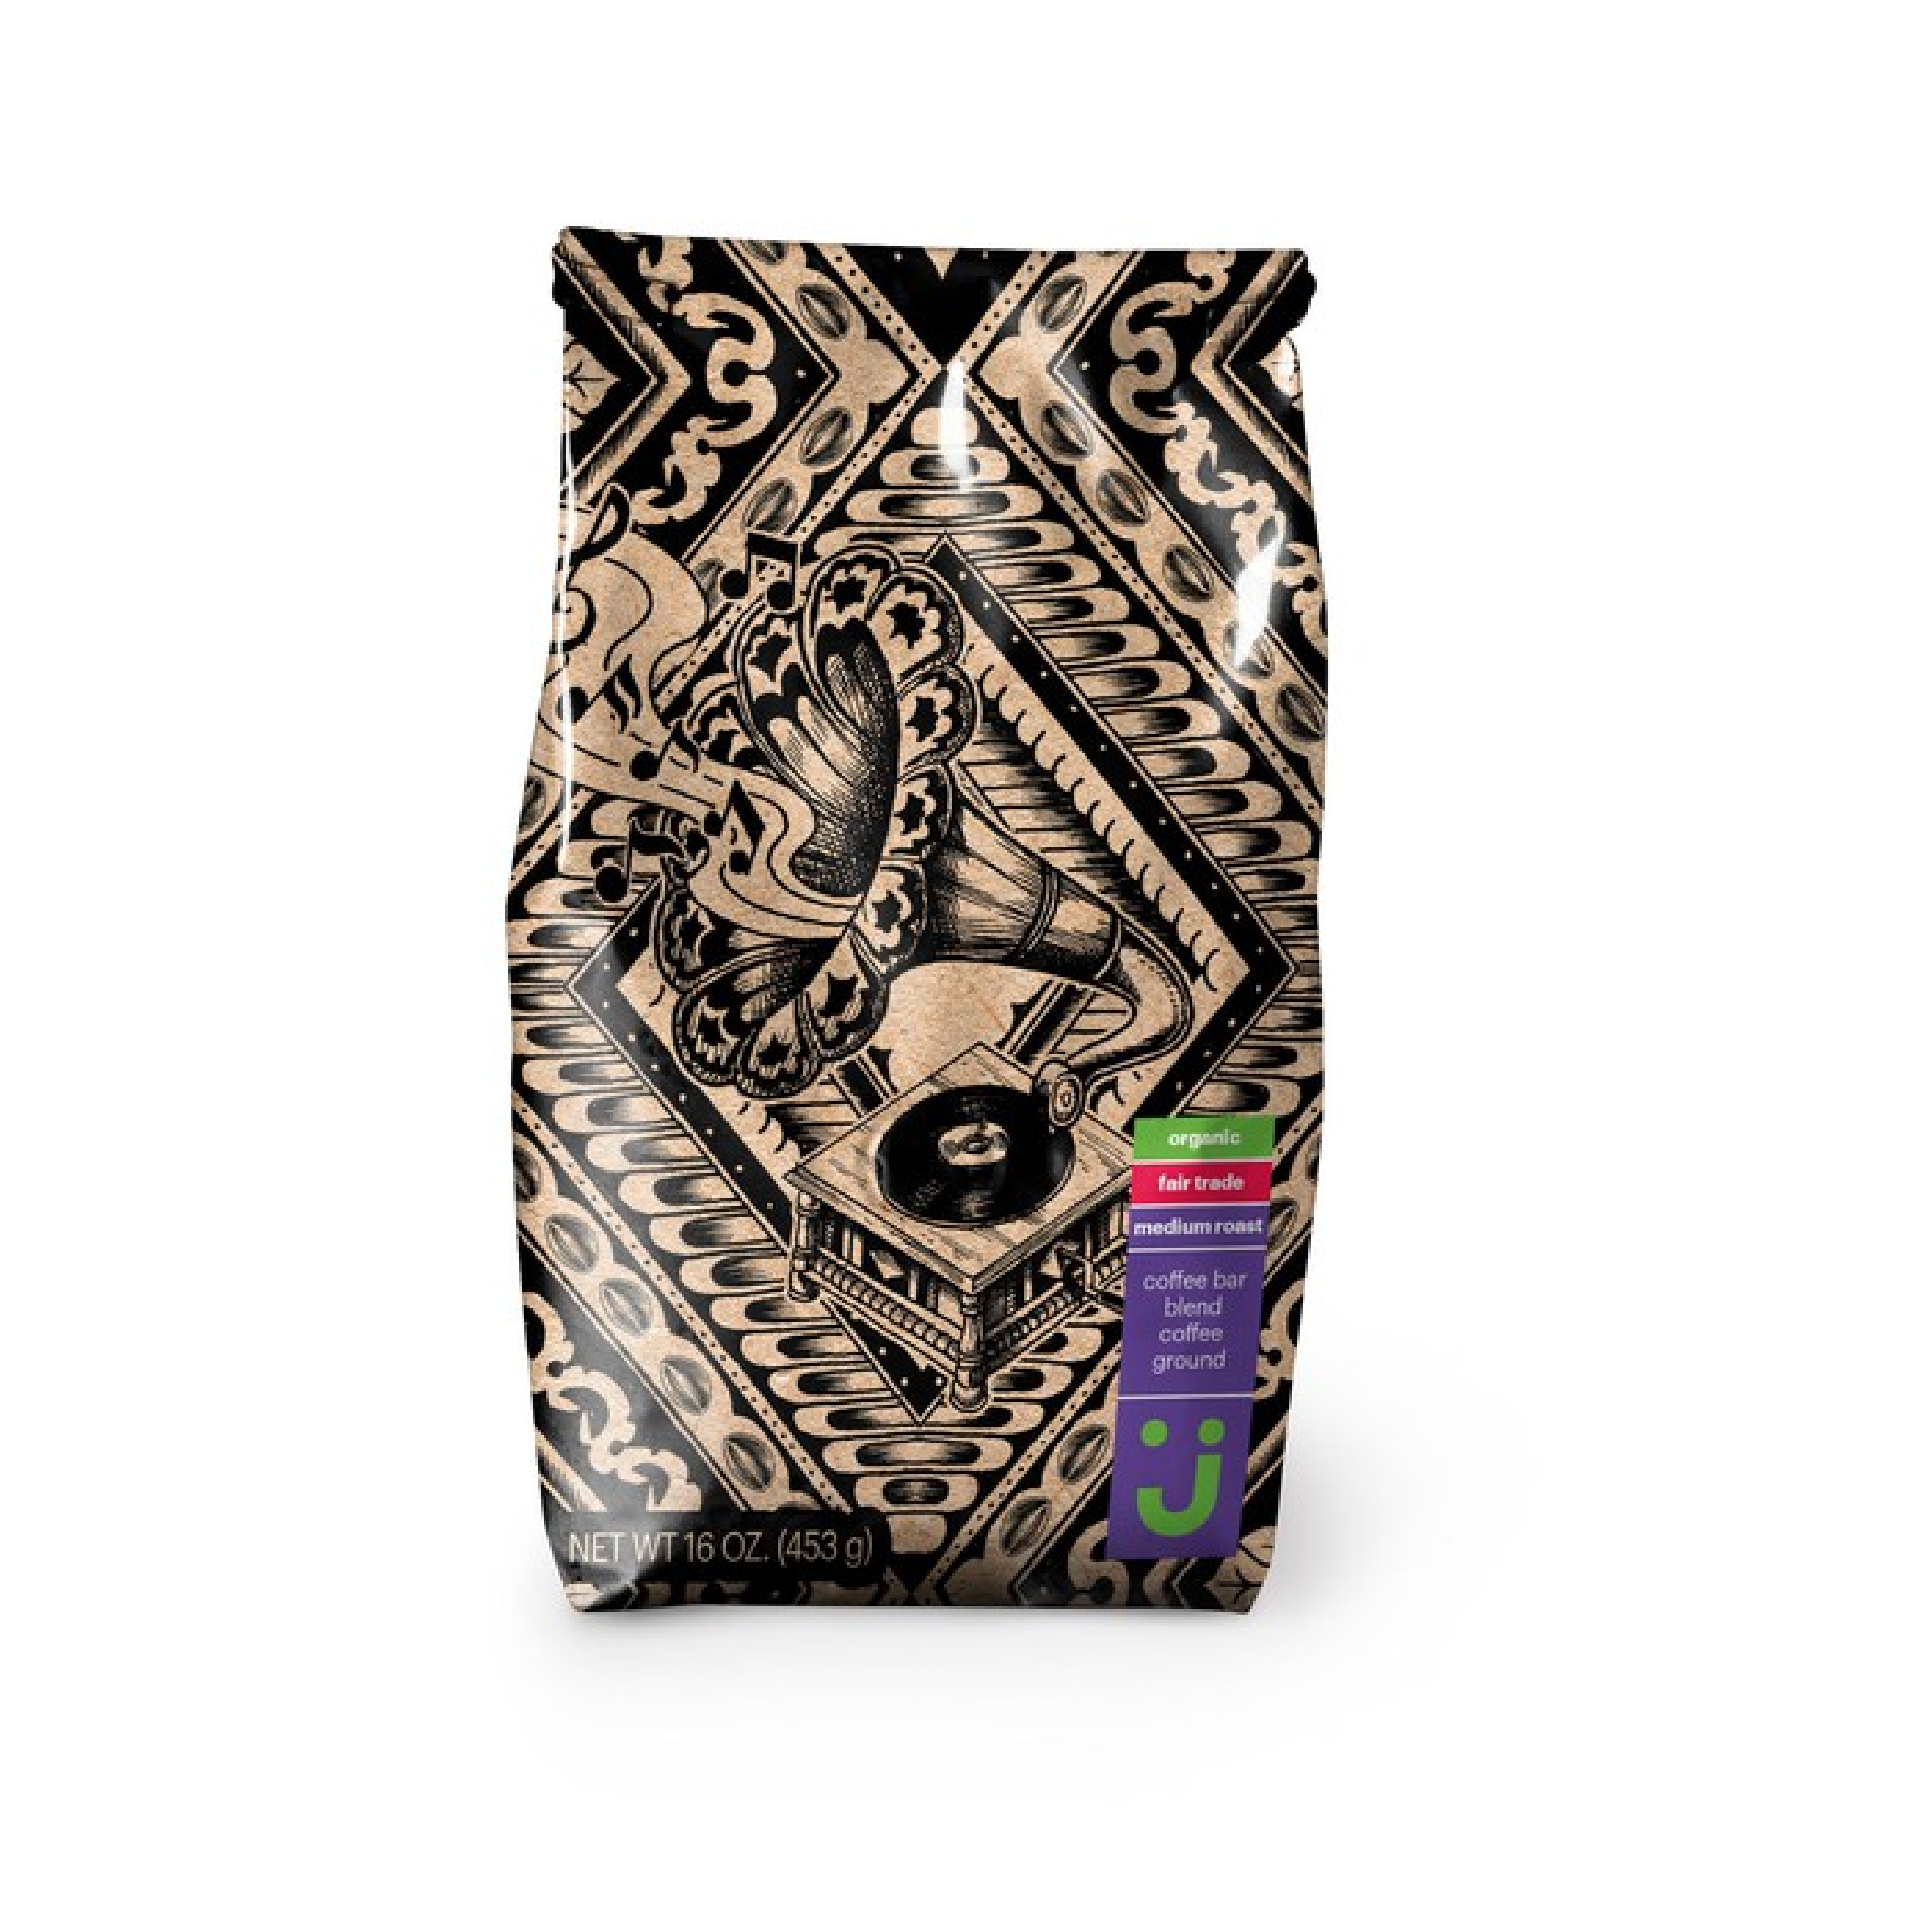 Jet.com's Uniquely J Coffee Bar Blend Ground Coffee.